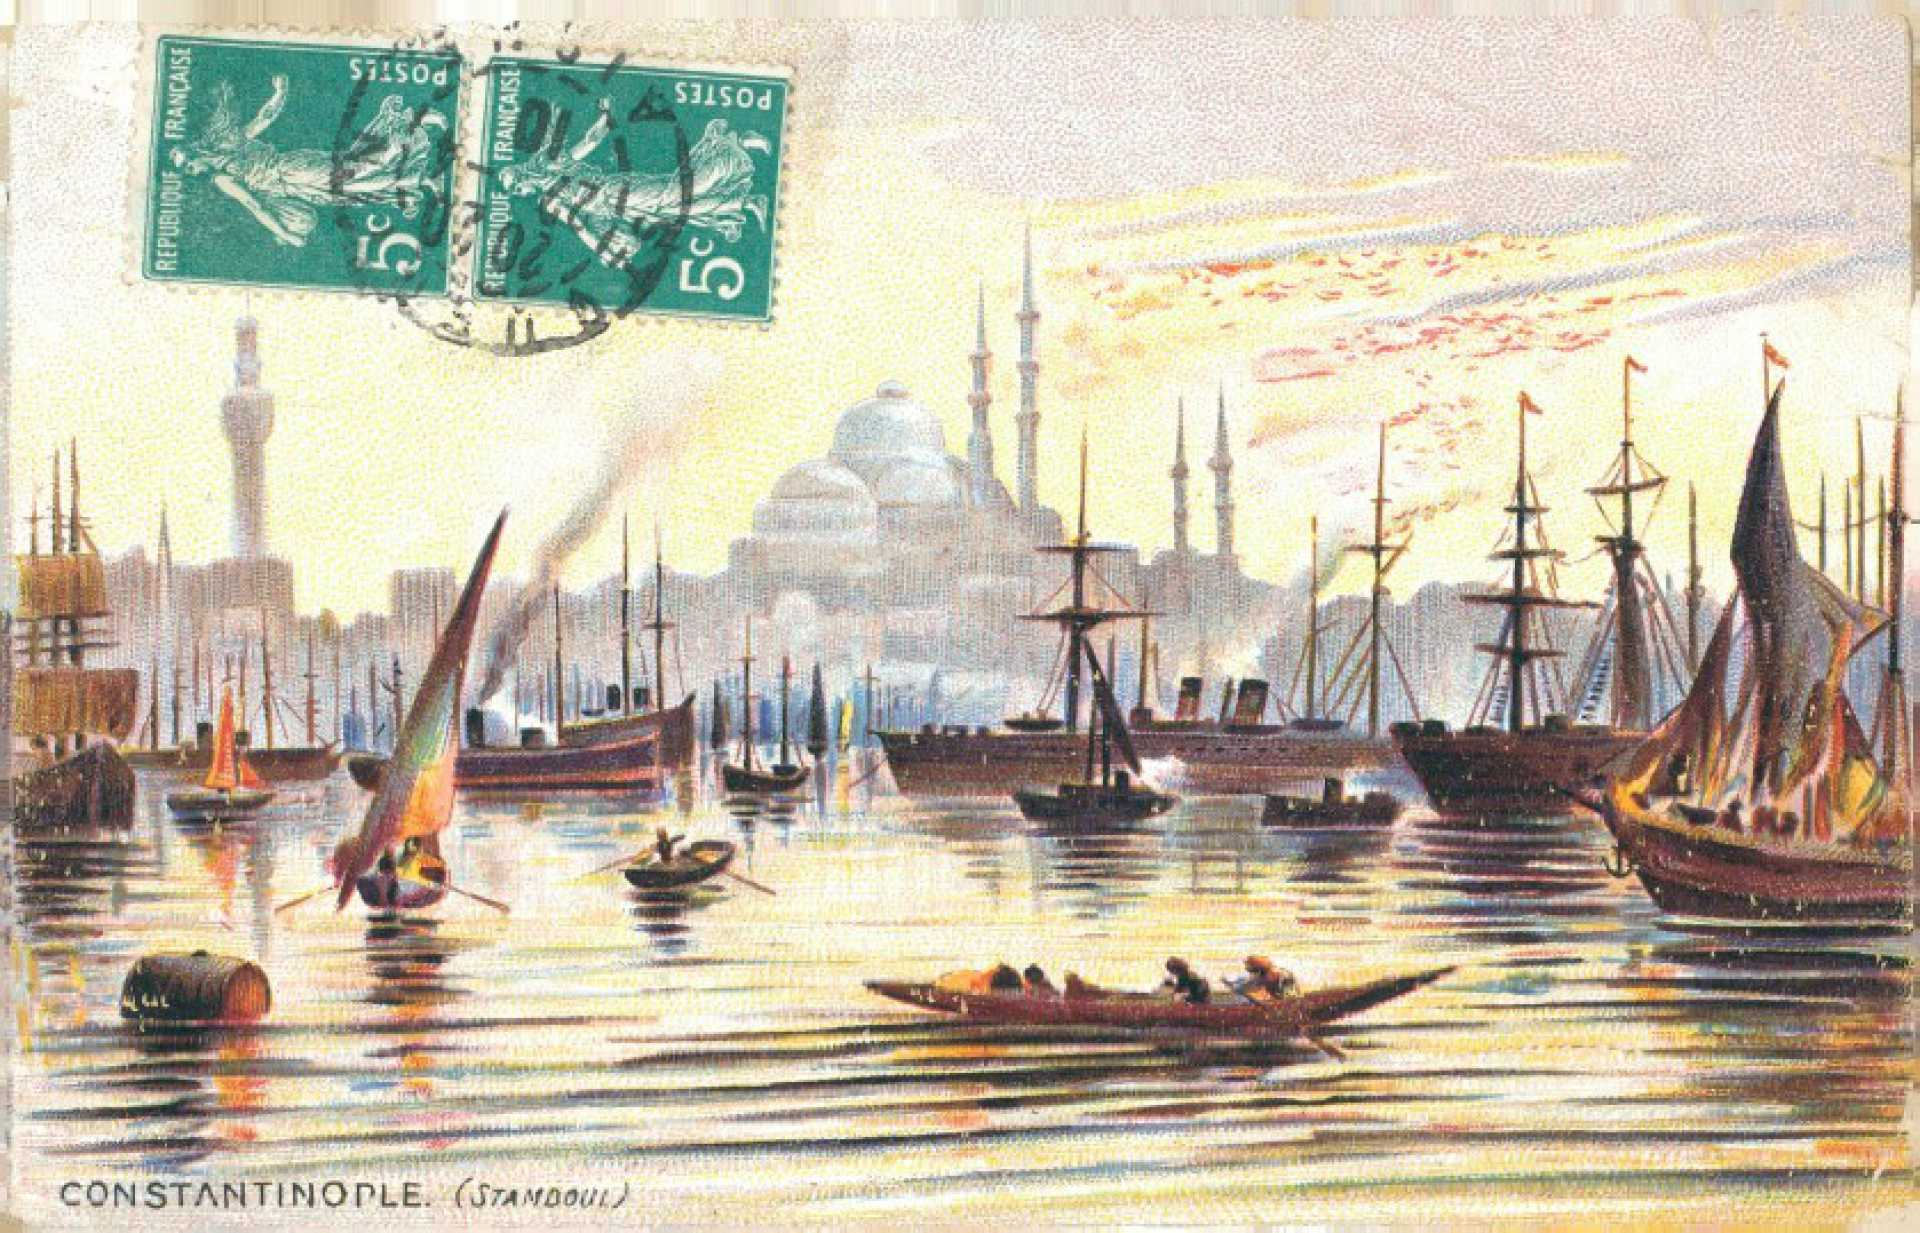 Constantinople (Stamboul)